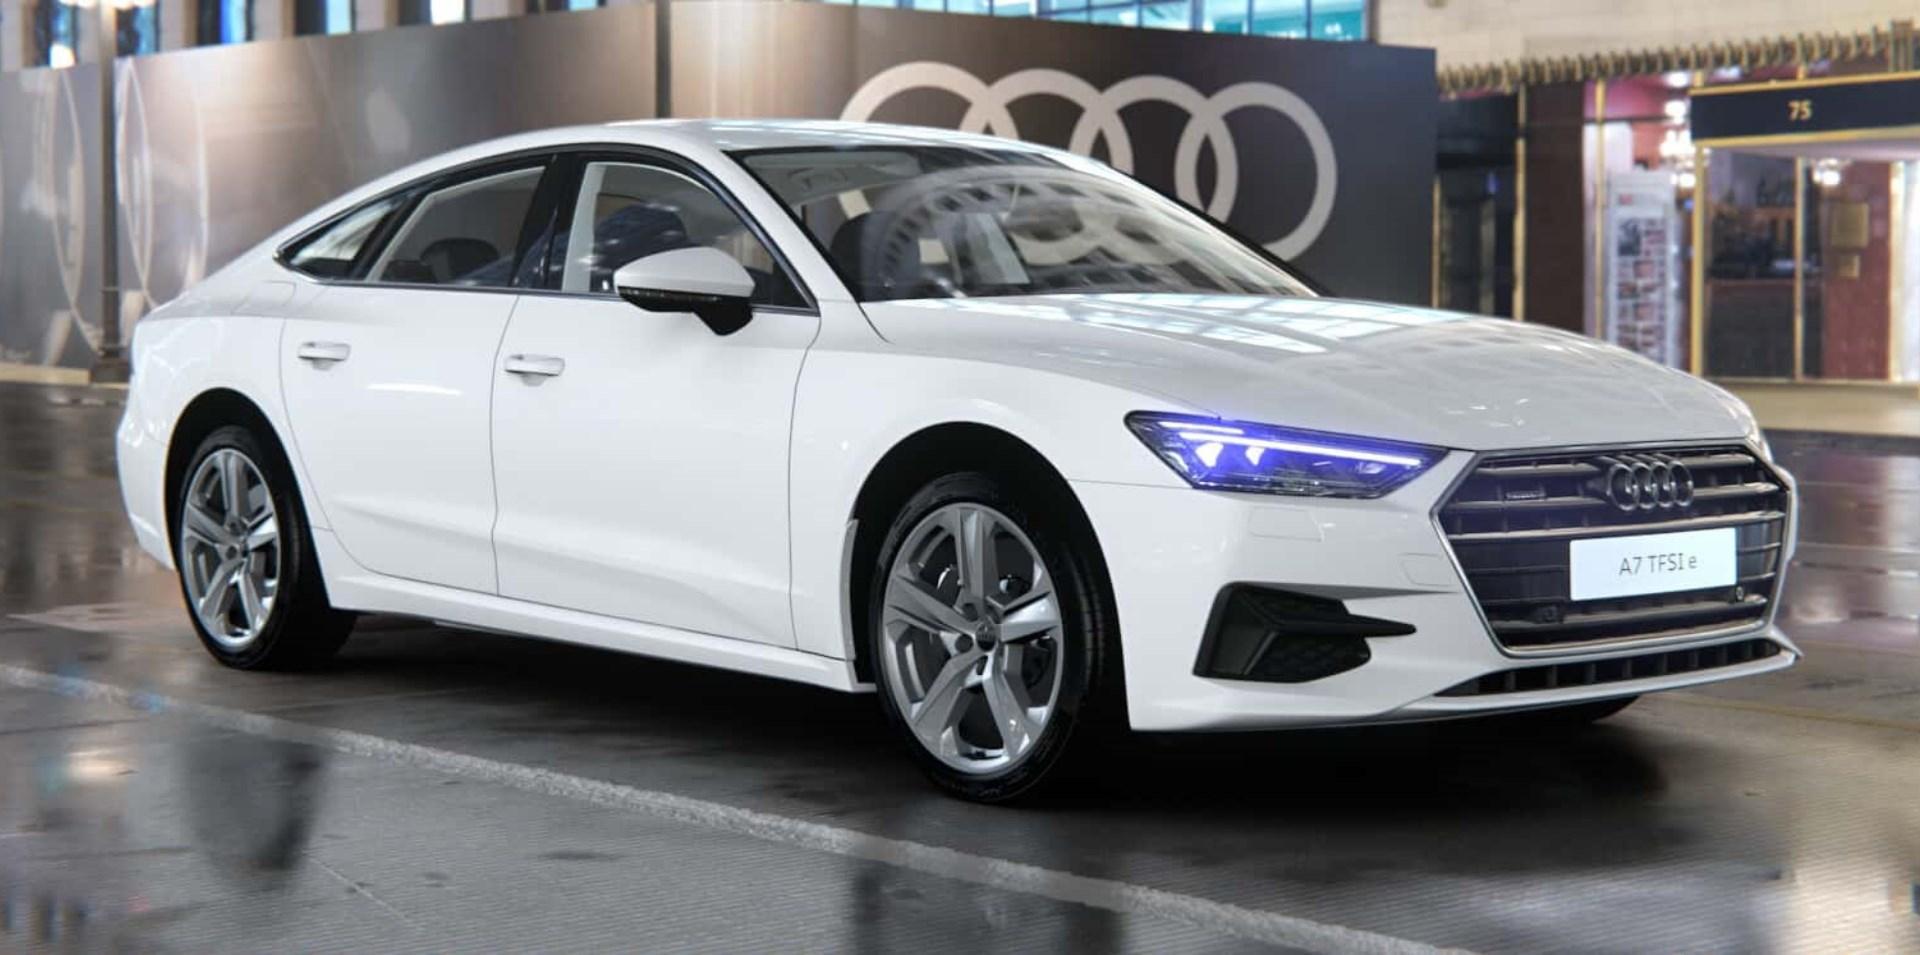 New Audi A7 TFSI e